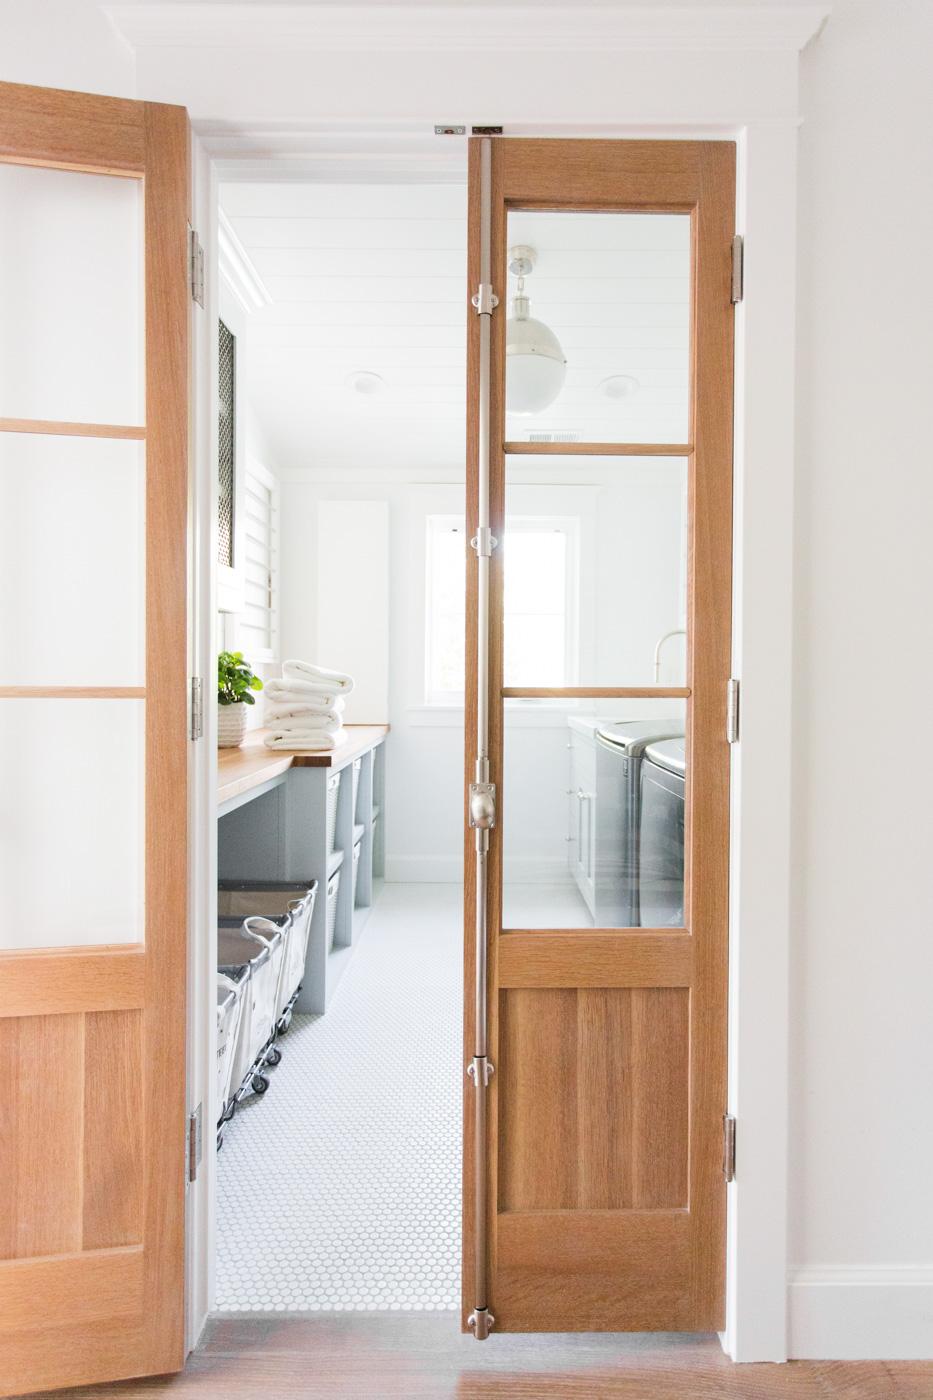 Natural wood door into laundry room || Studio McGee